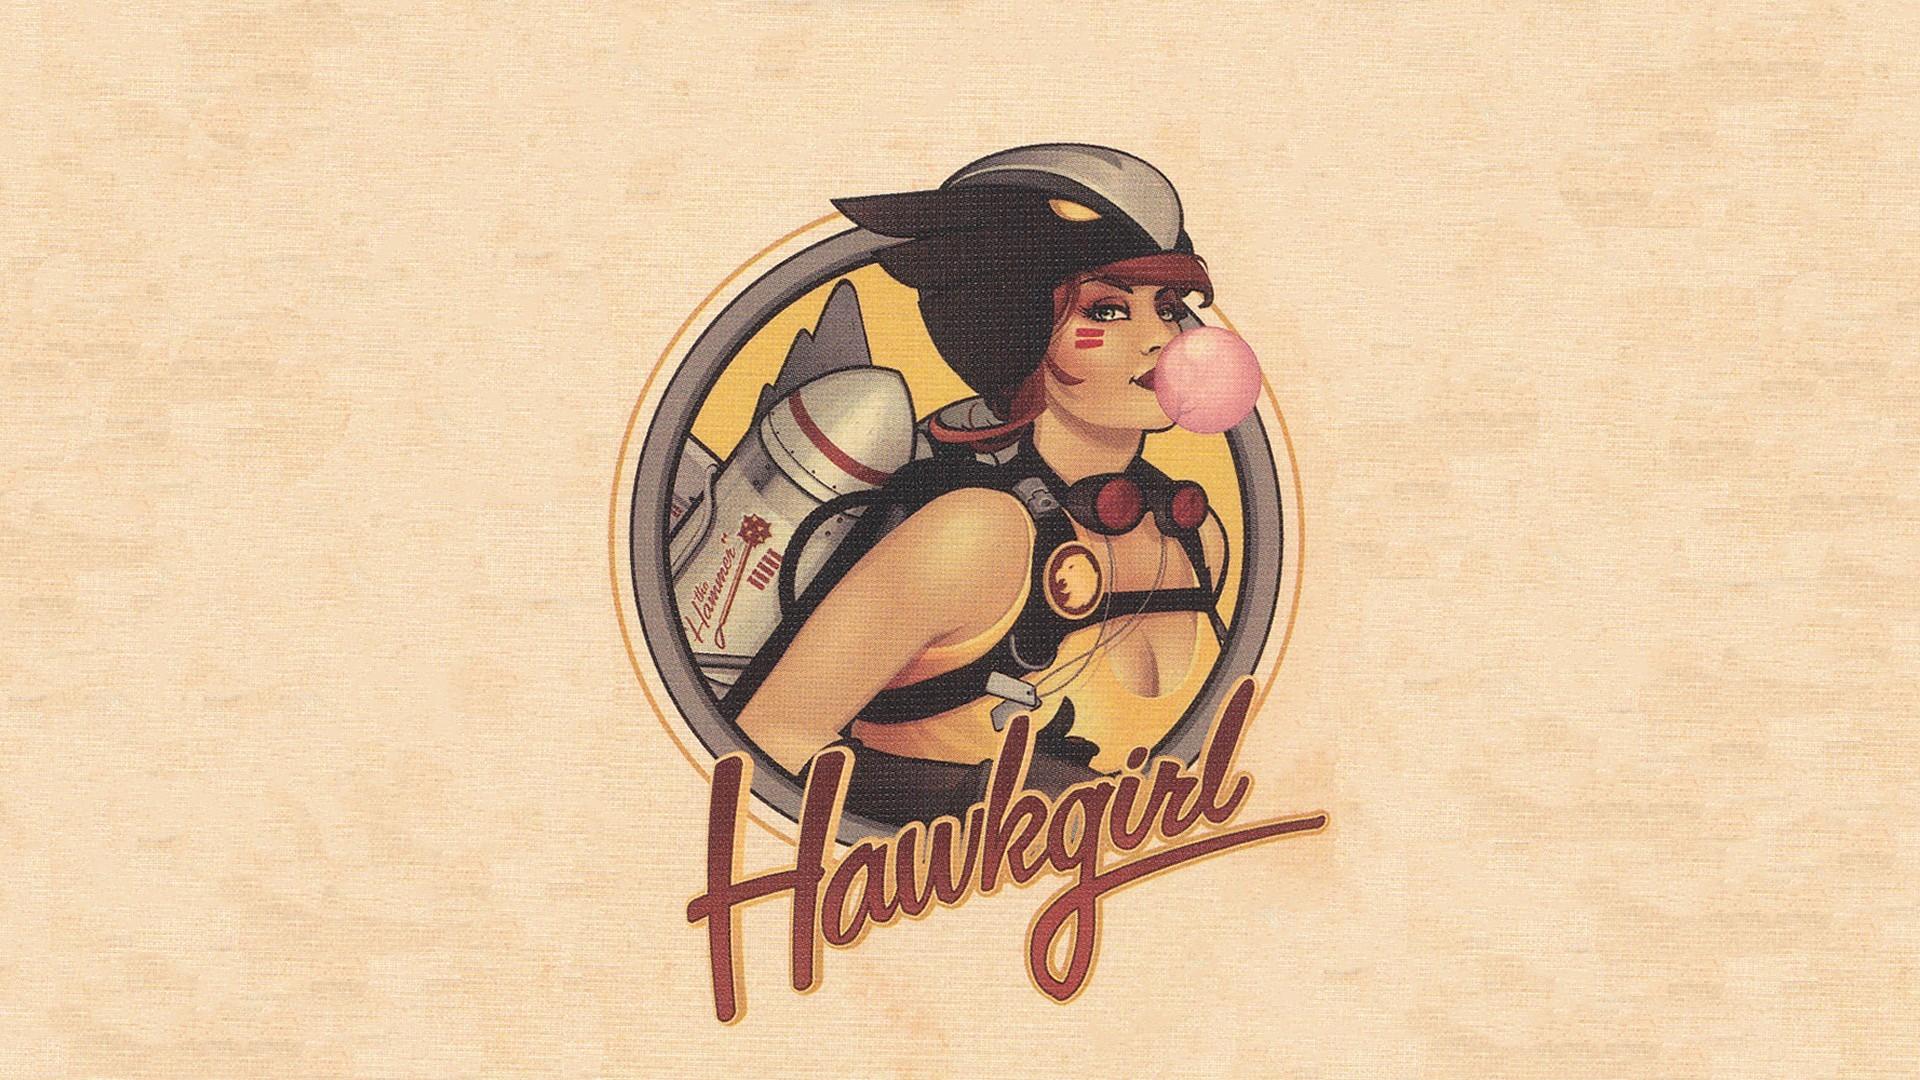 Res: 1920x1080, redhead, Hawkgirl, DC Comics, Textured, Superheroines, Texture, Comics,  Comic books, Bombshells Wallpapers HD / Desktop and Mobile Backgrounds